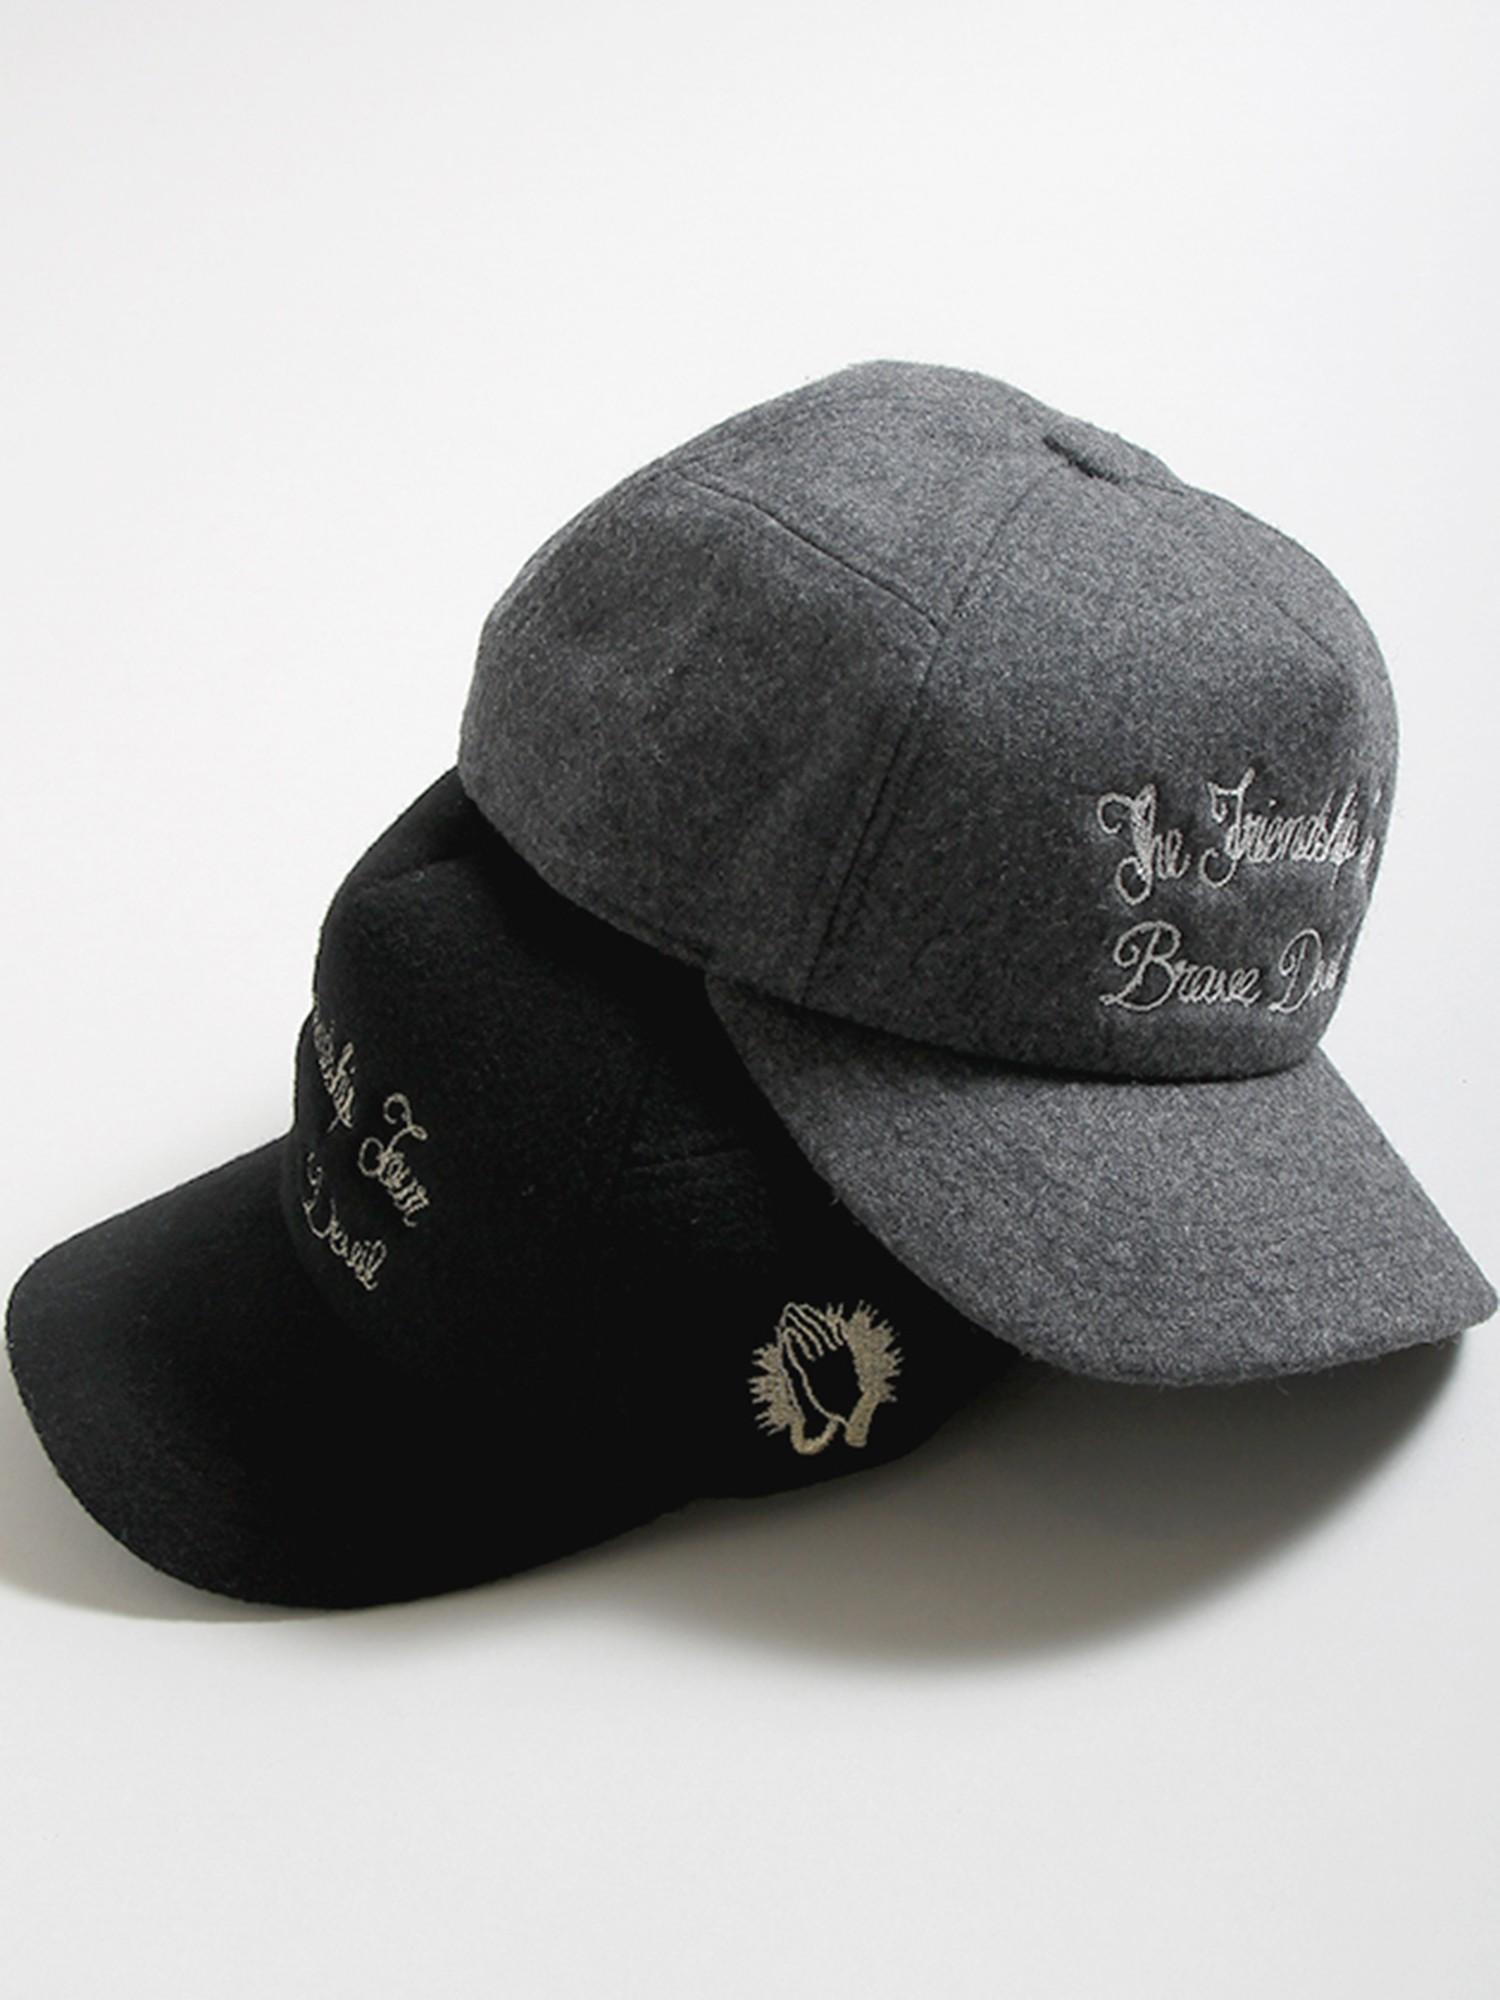 WEGO/チェーン刺繍カーブキャップ